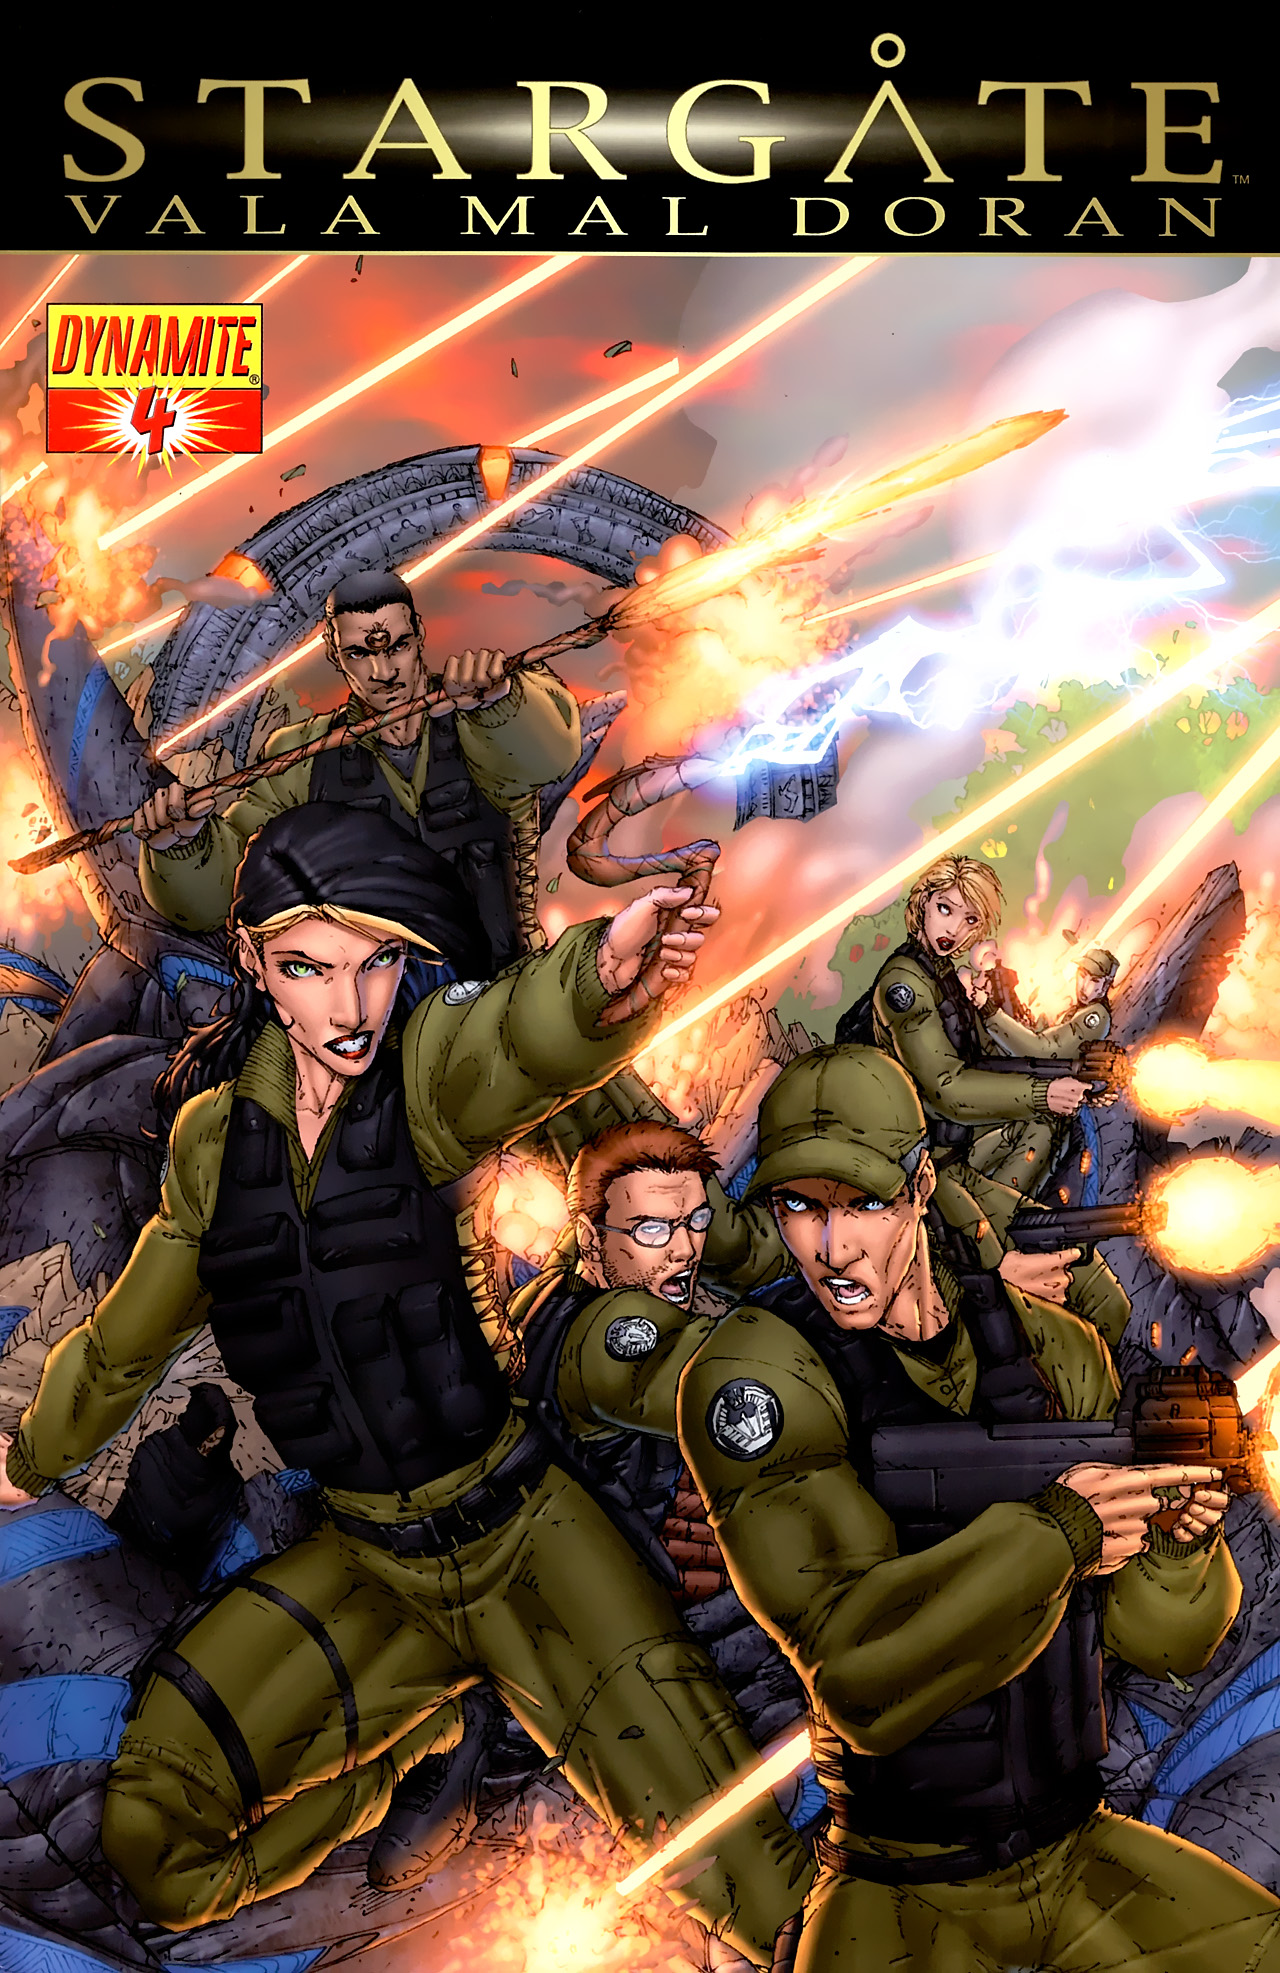 Stargate: Vala Mal Doran 4